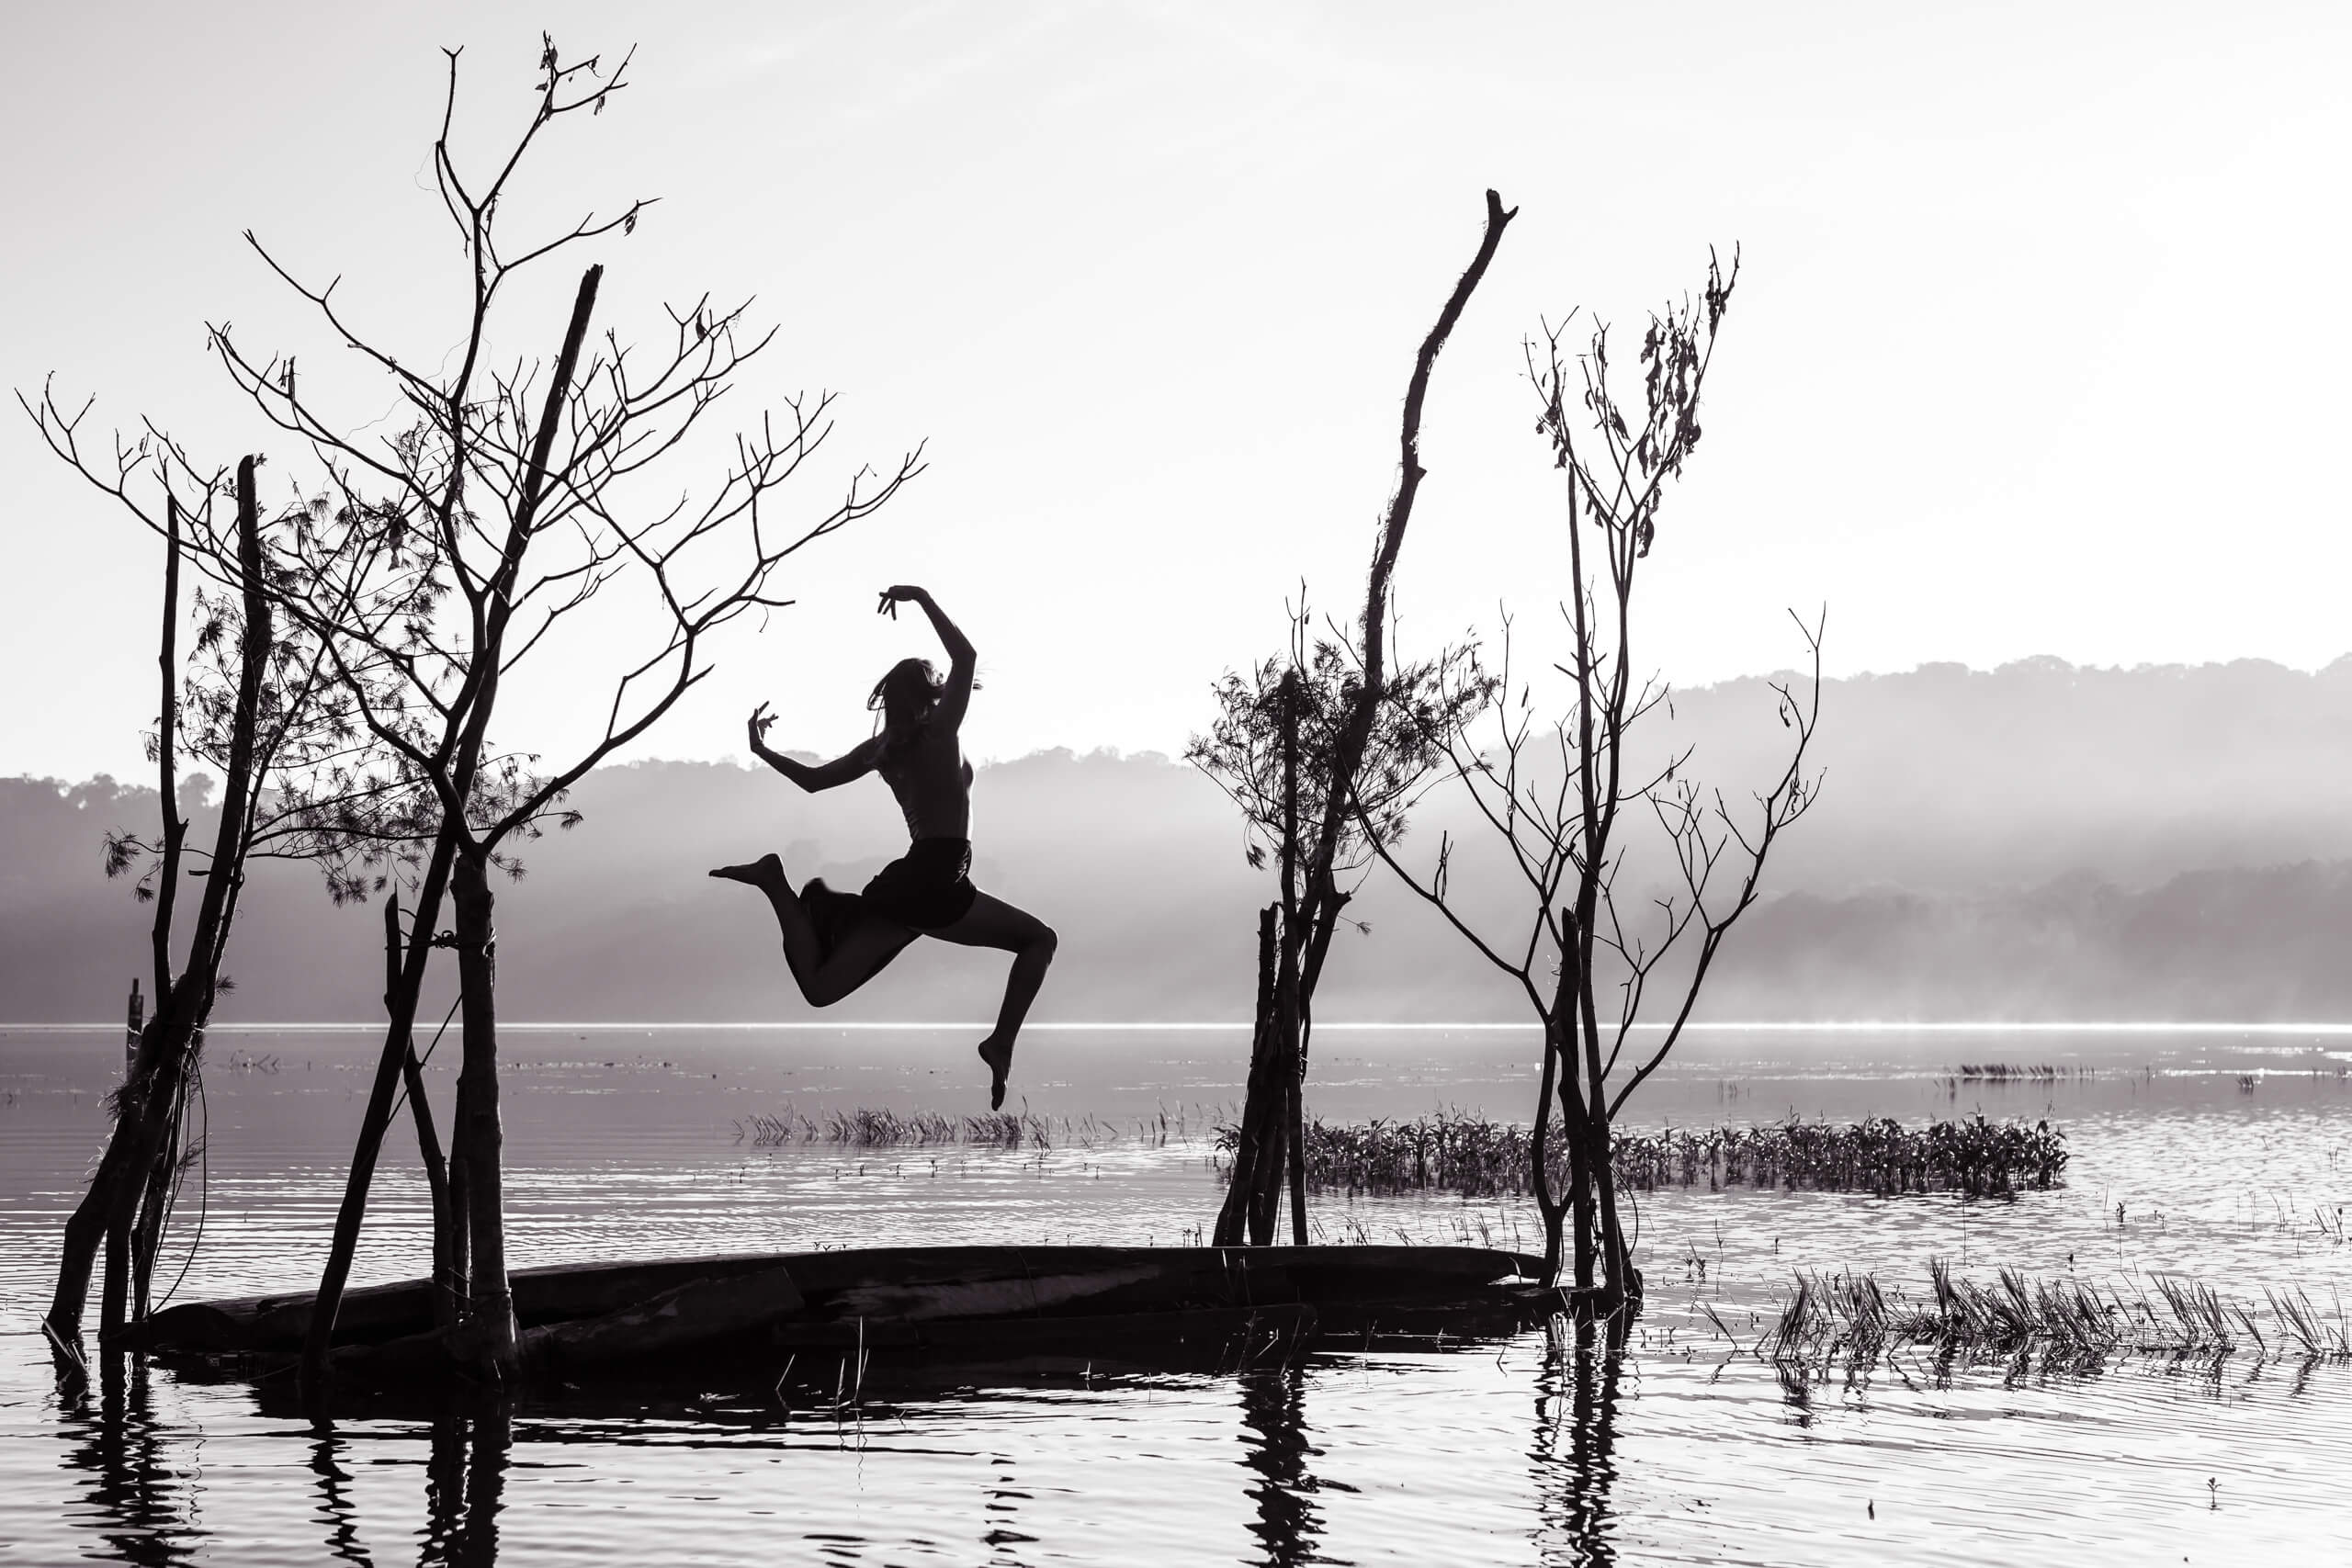 TAMBLINGAN LAKE TEMPLE   The small floating platform made of trees and planks had Sam jumping for joy.